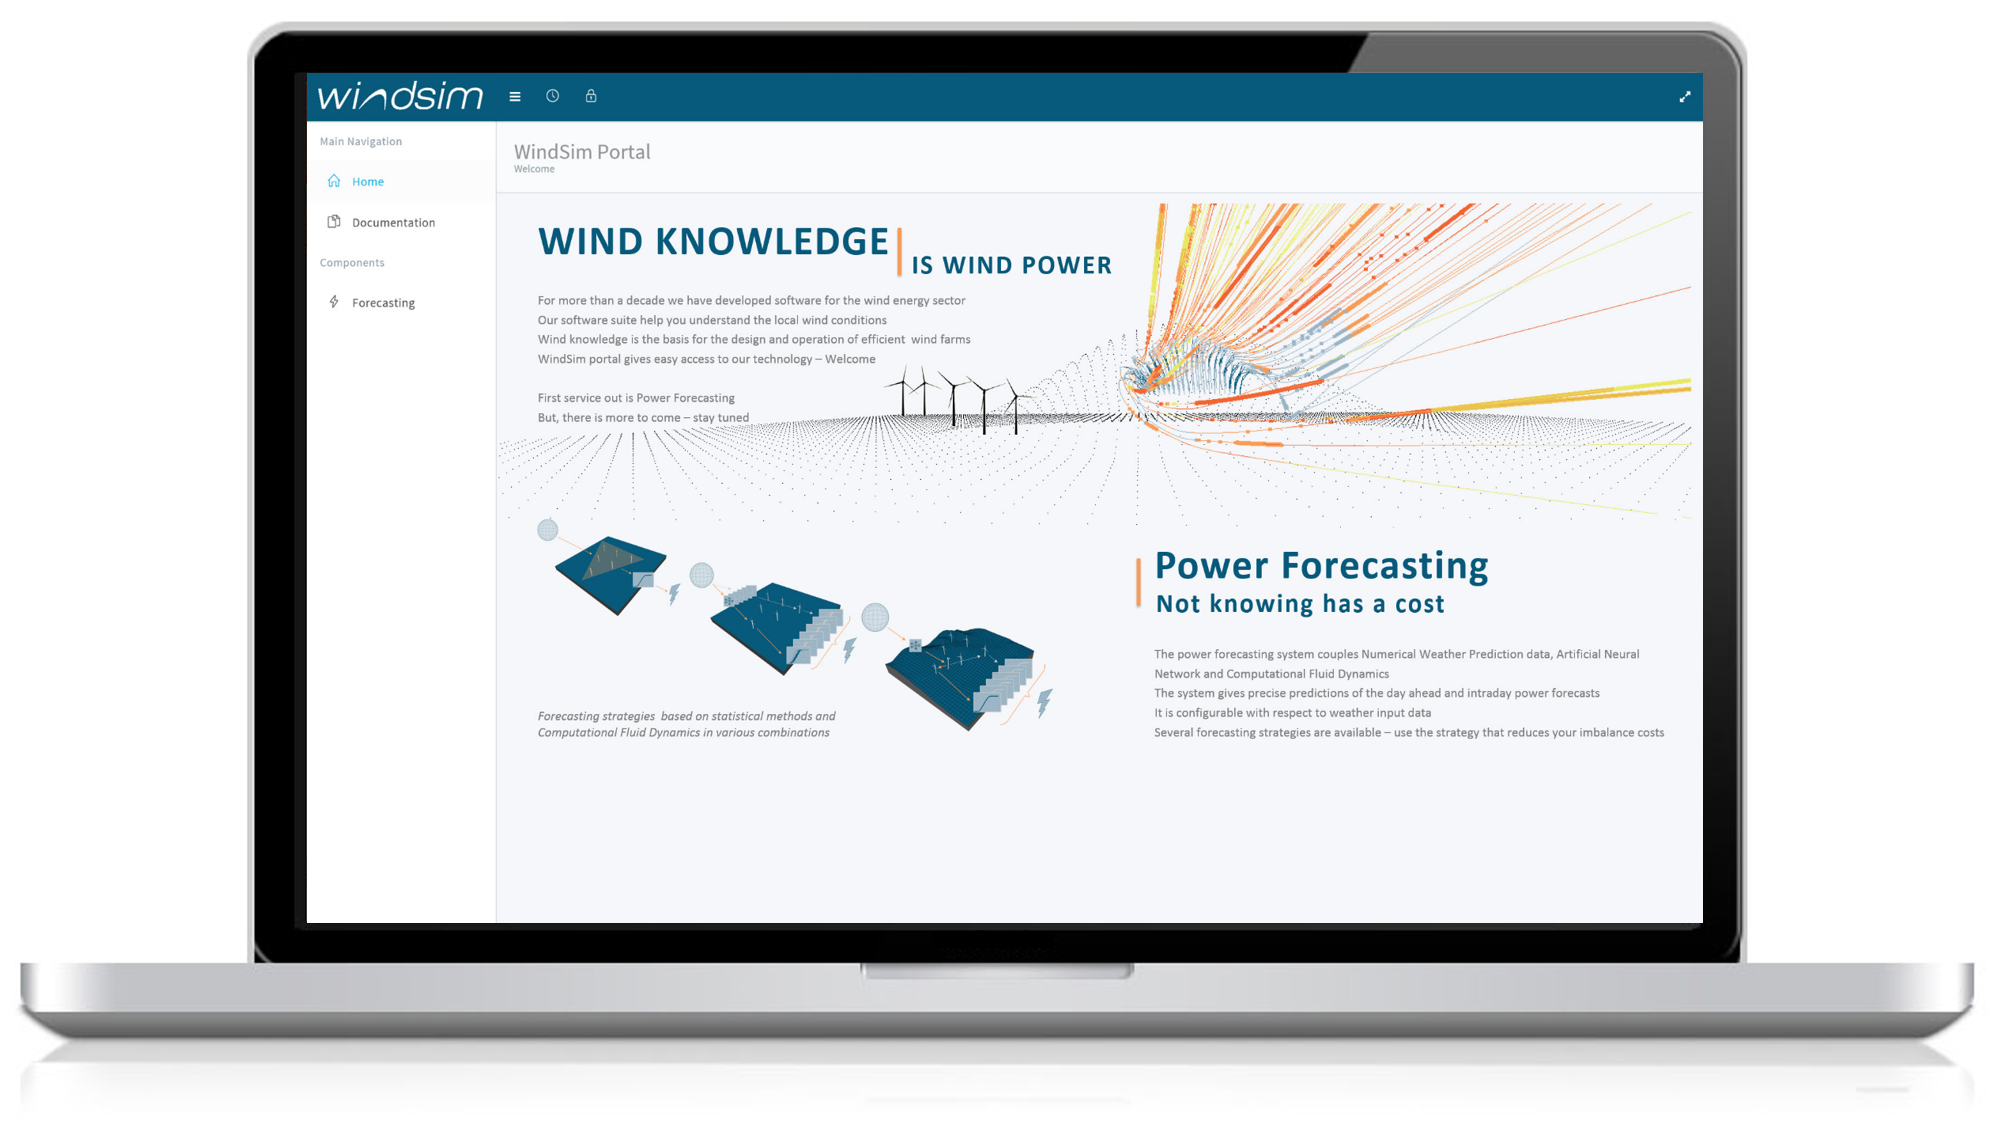 windsim power forecasting portal login